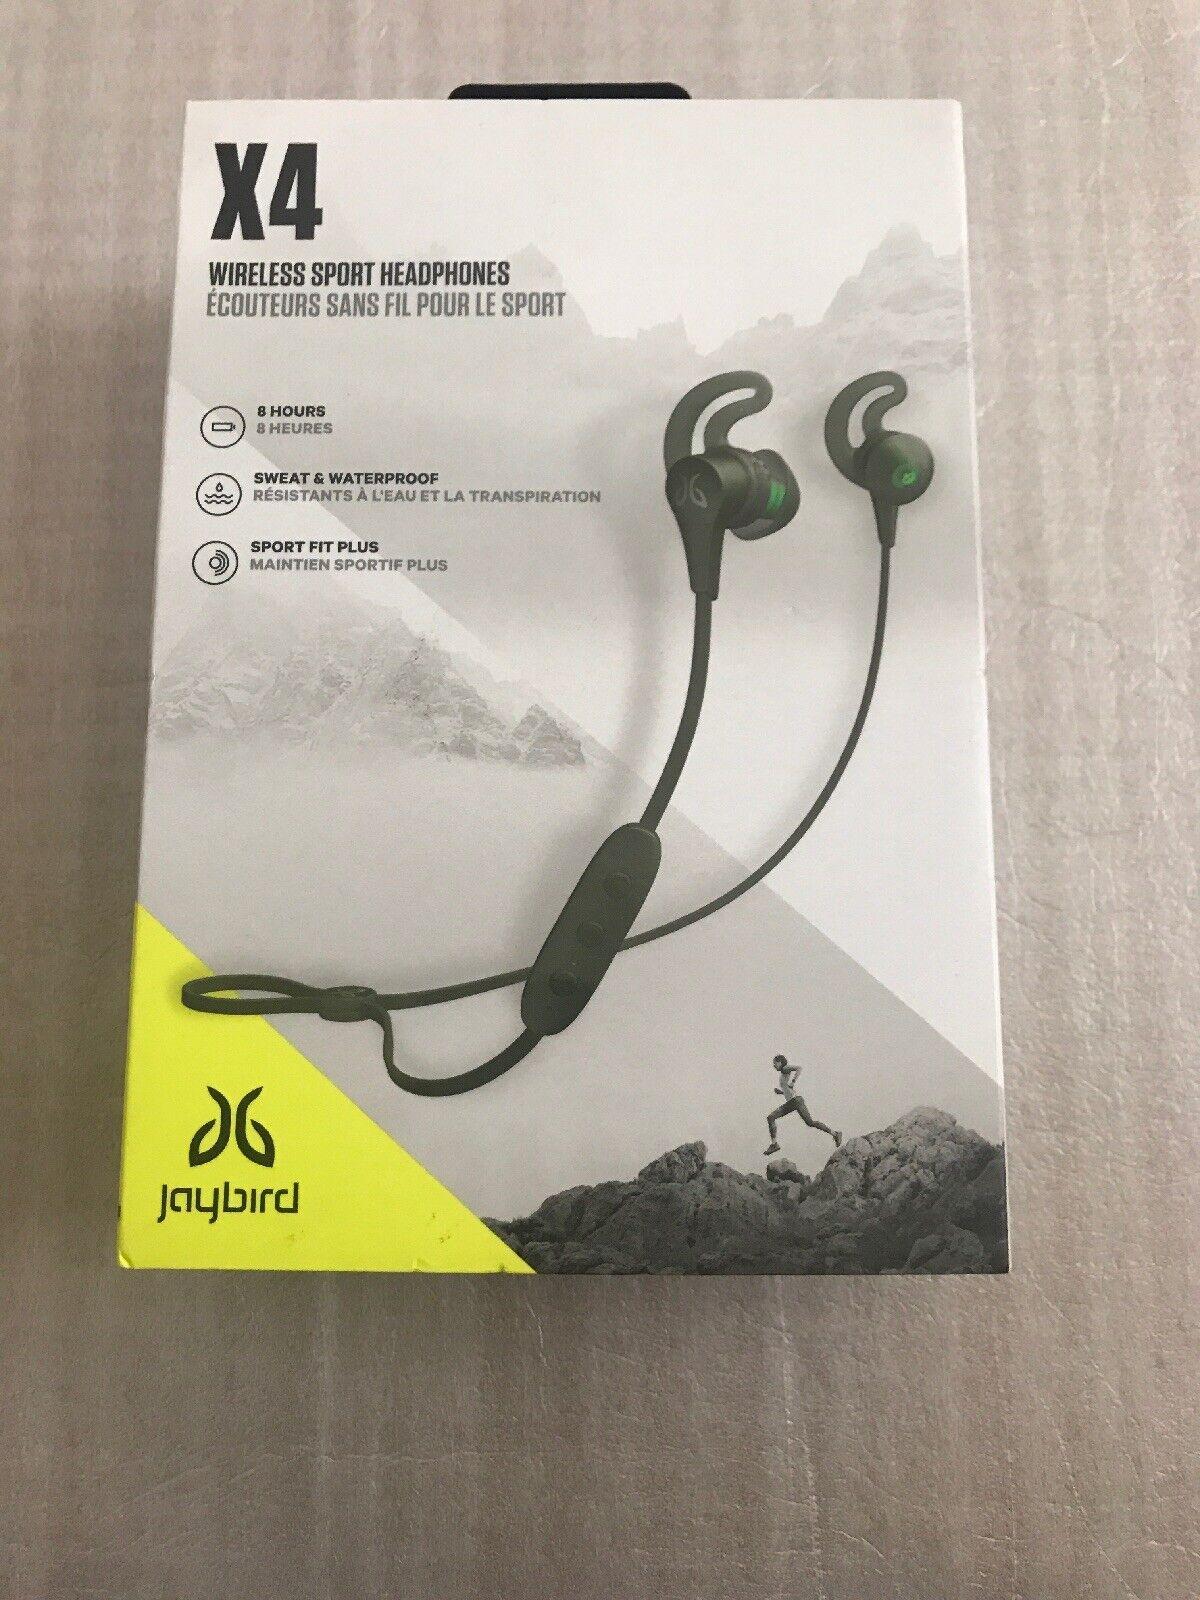 cdf10a61313 Jaybird X4 In-Ear Wireless Headphones - Alpha Metallic/Jade for sale online    eBay